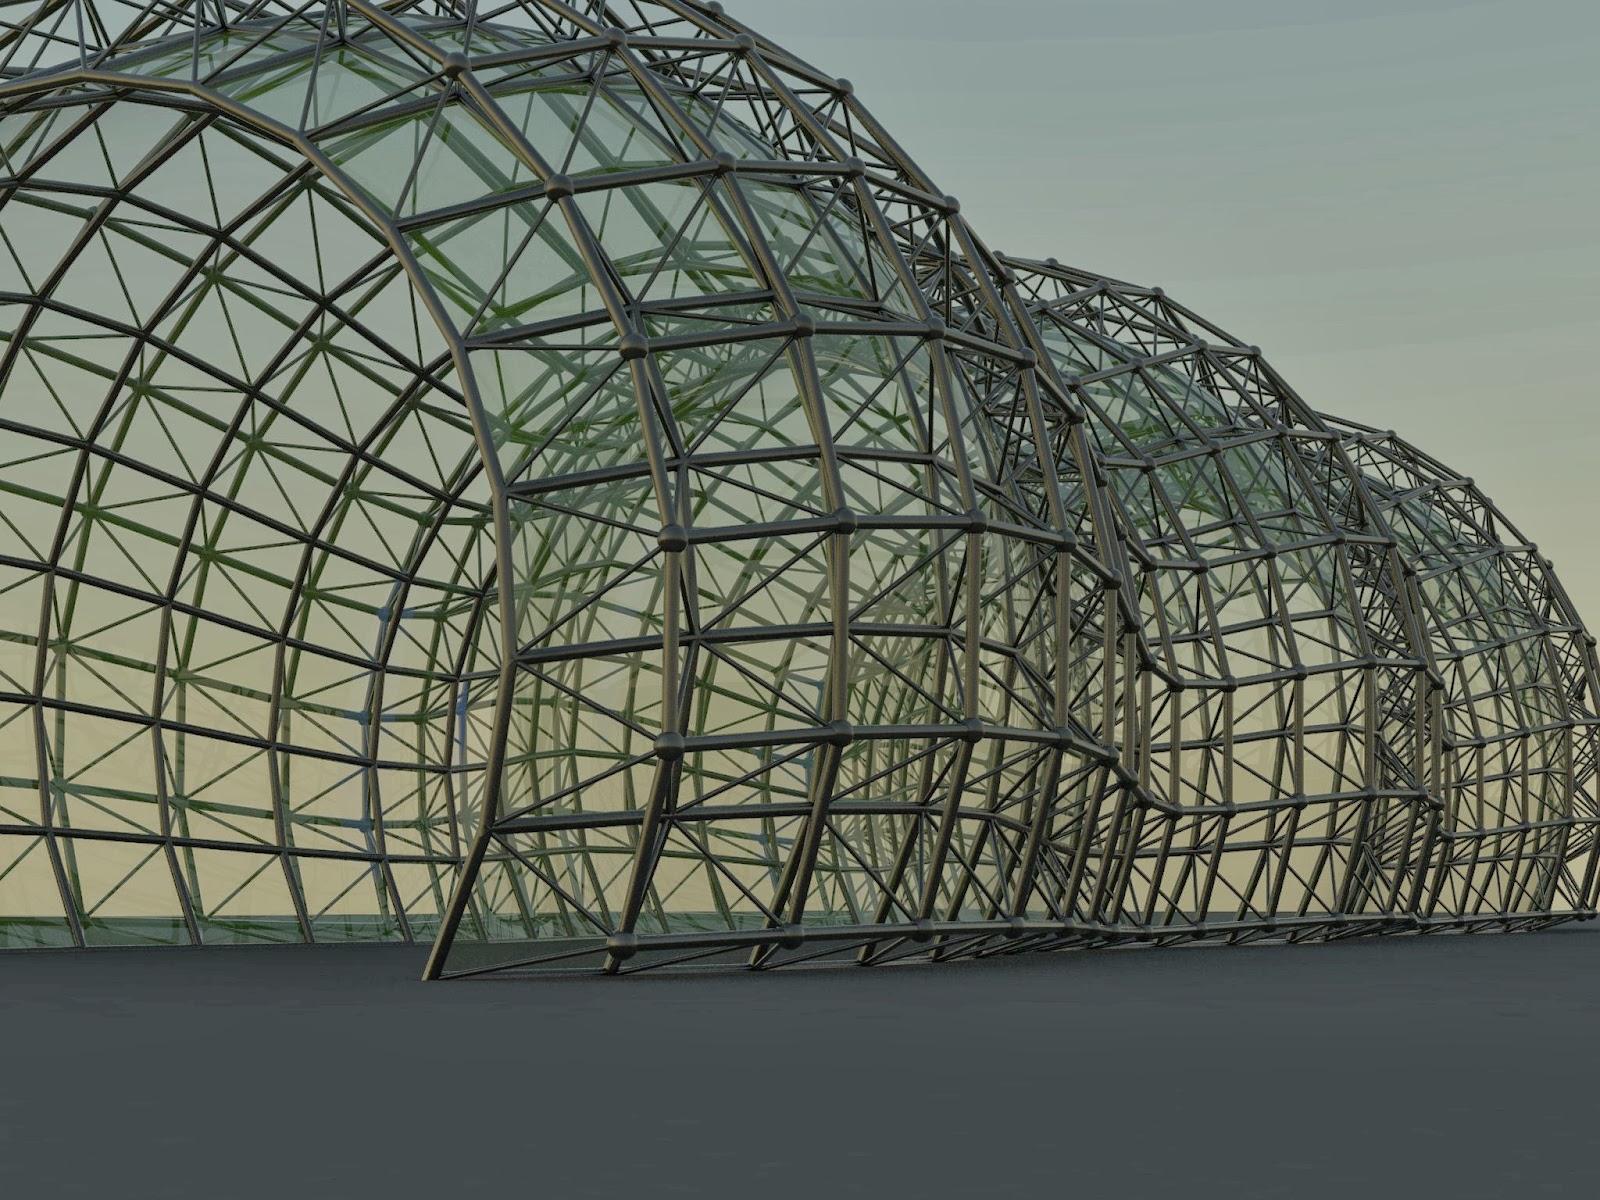 Grasshopper Rhino Architecture | www.pixshark.com - Images ...